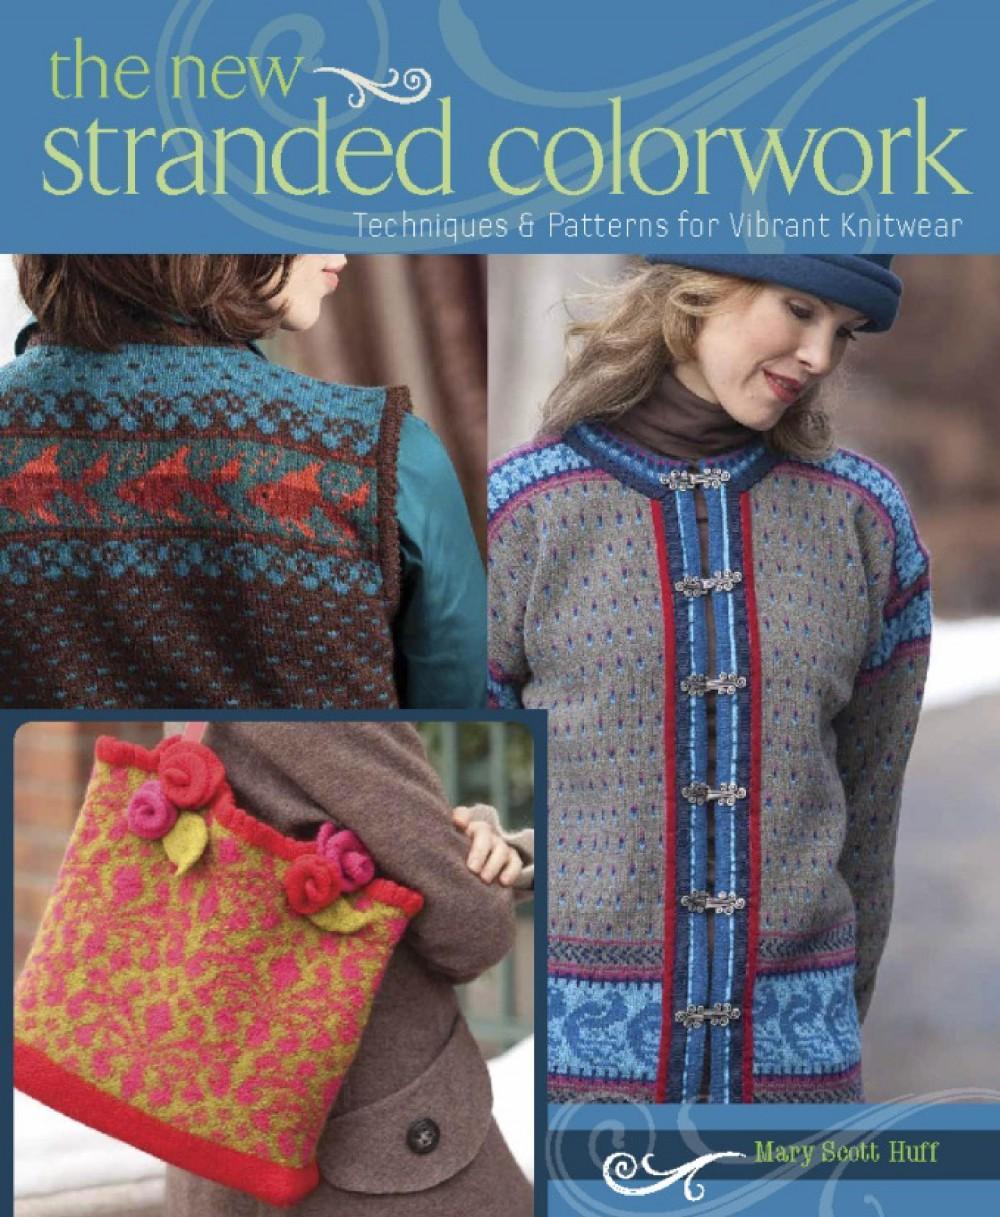 The-New-Stranded-Colorwork_1.jpg